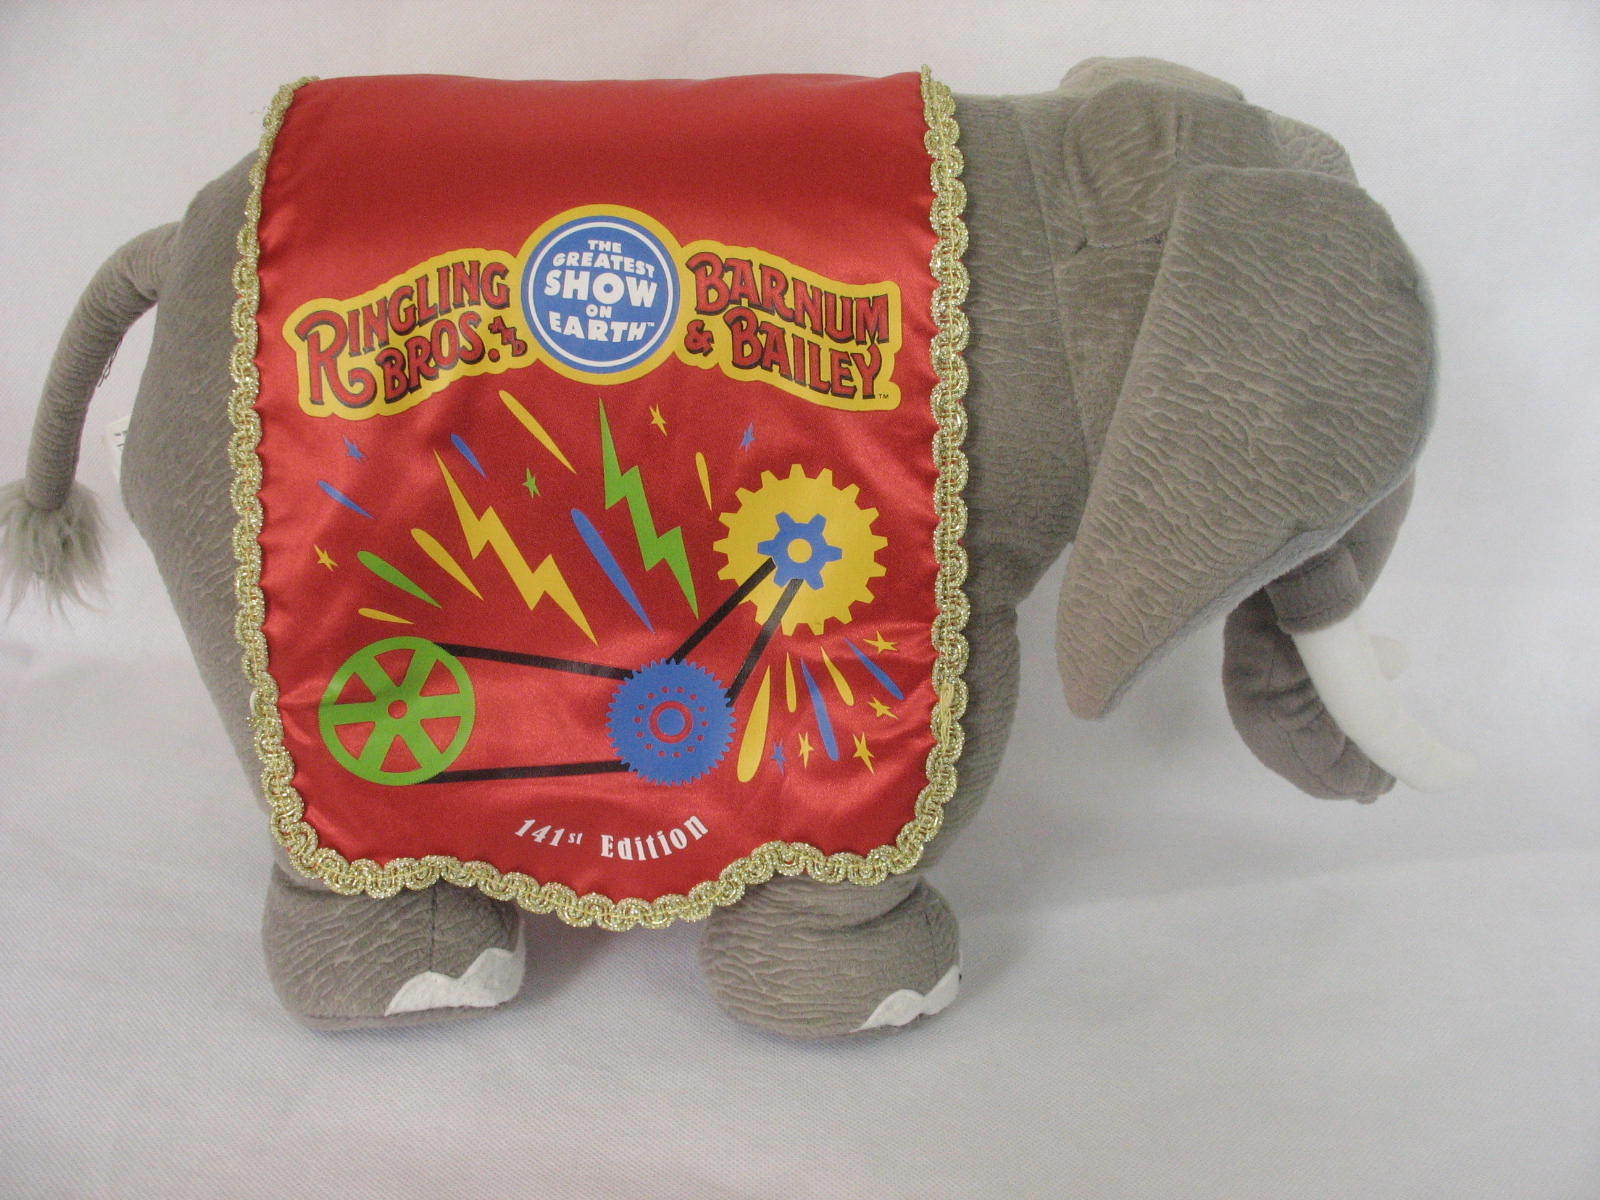 Ringling Bros Barnum and Bailey 141st Edition Circus Elephant Stuffed Plush image 4